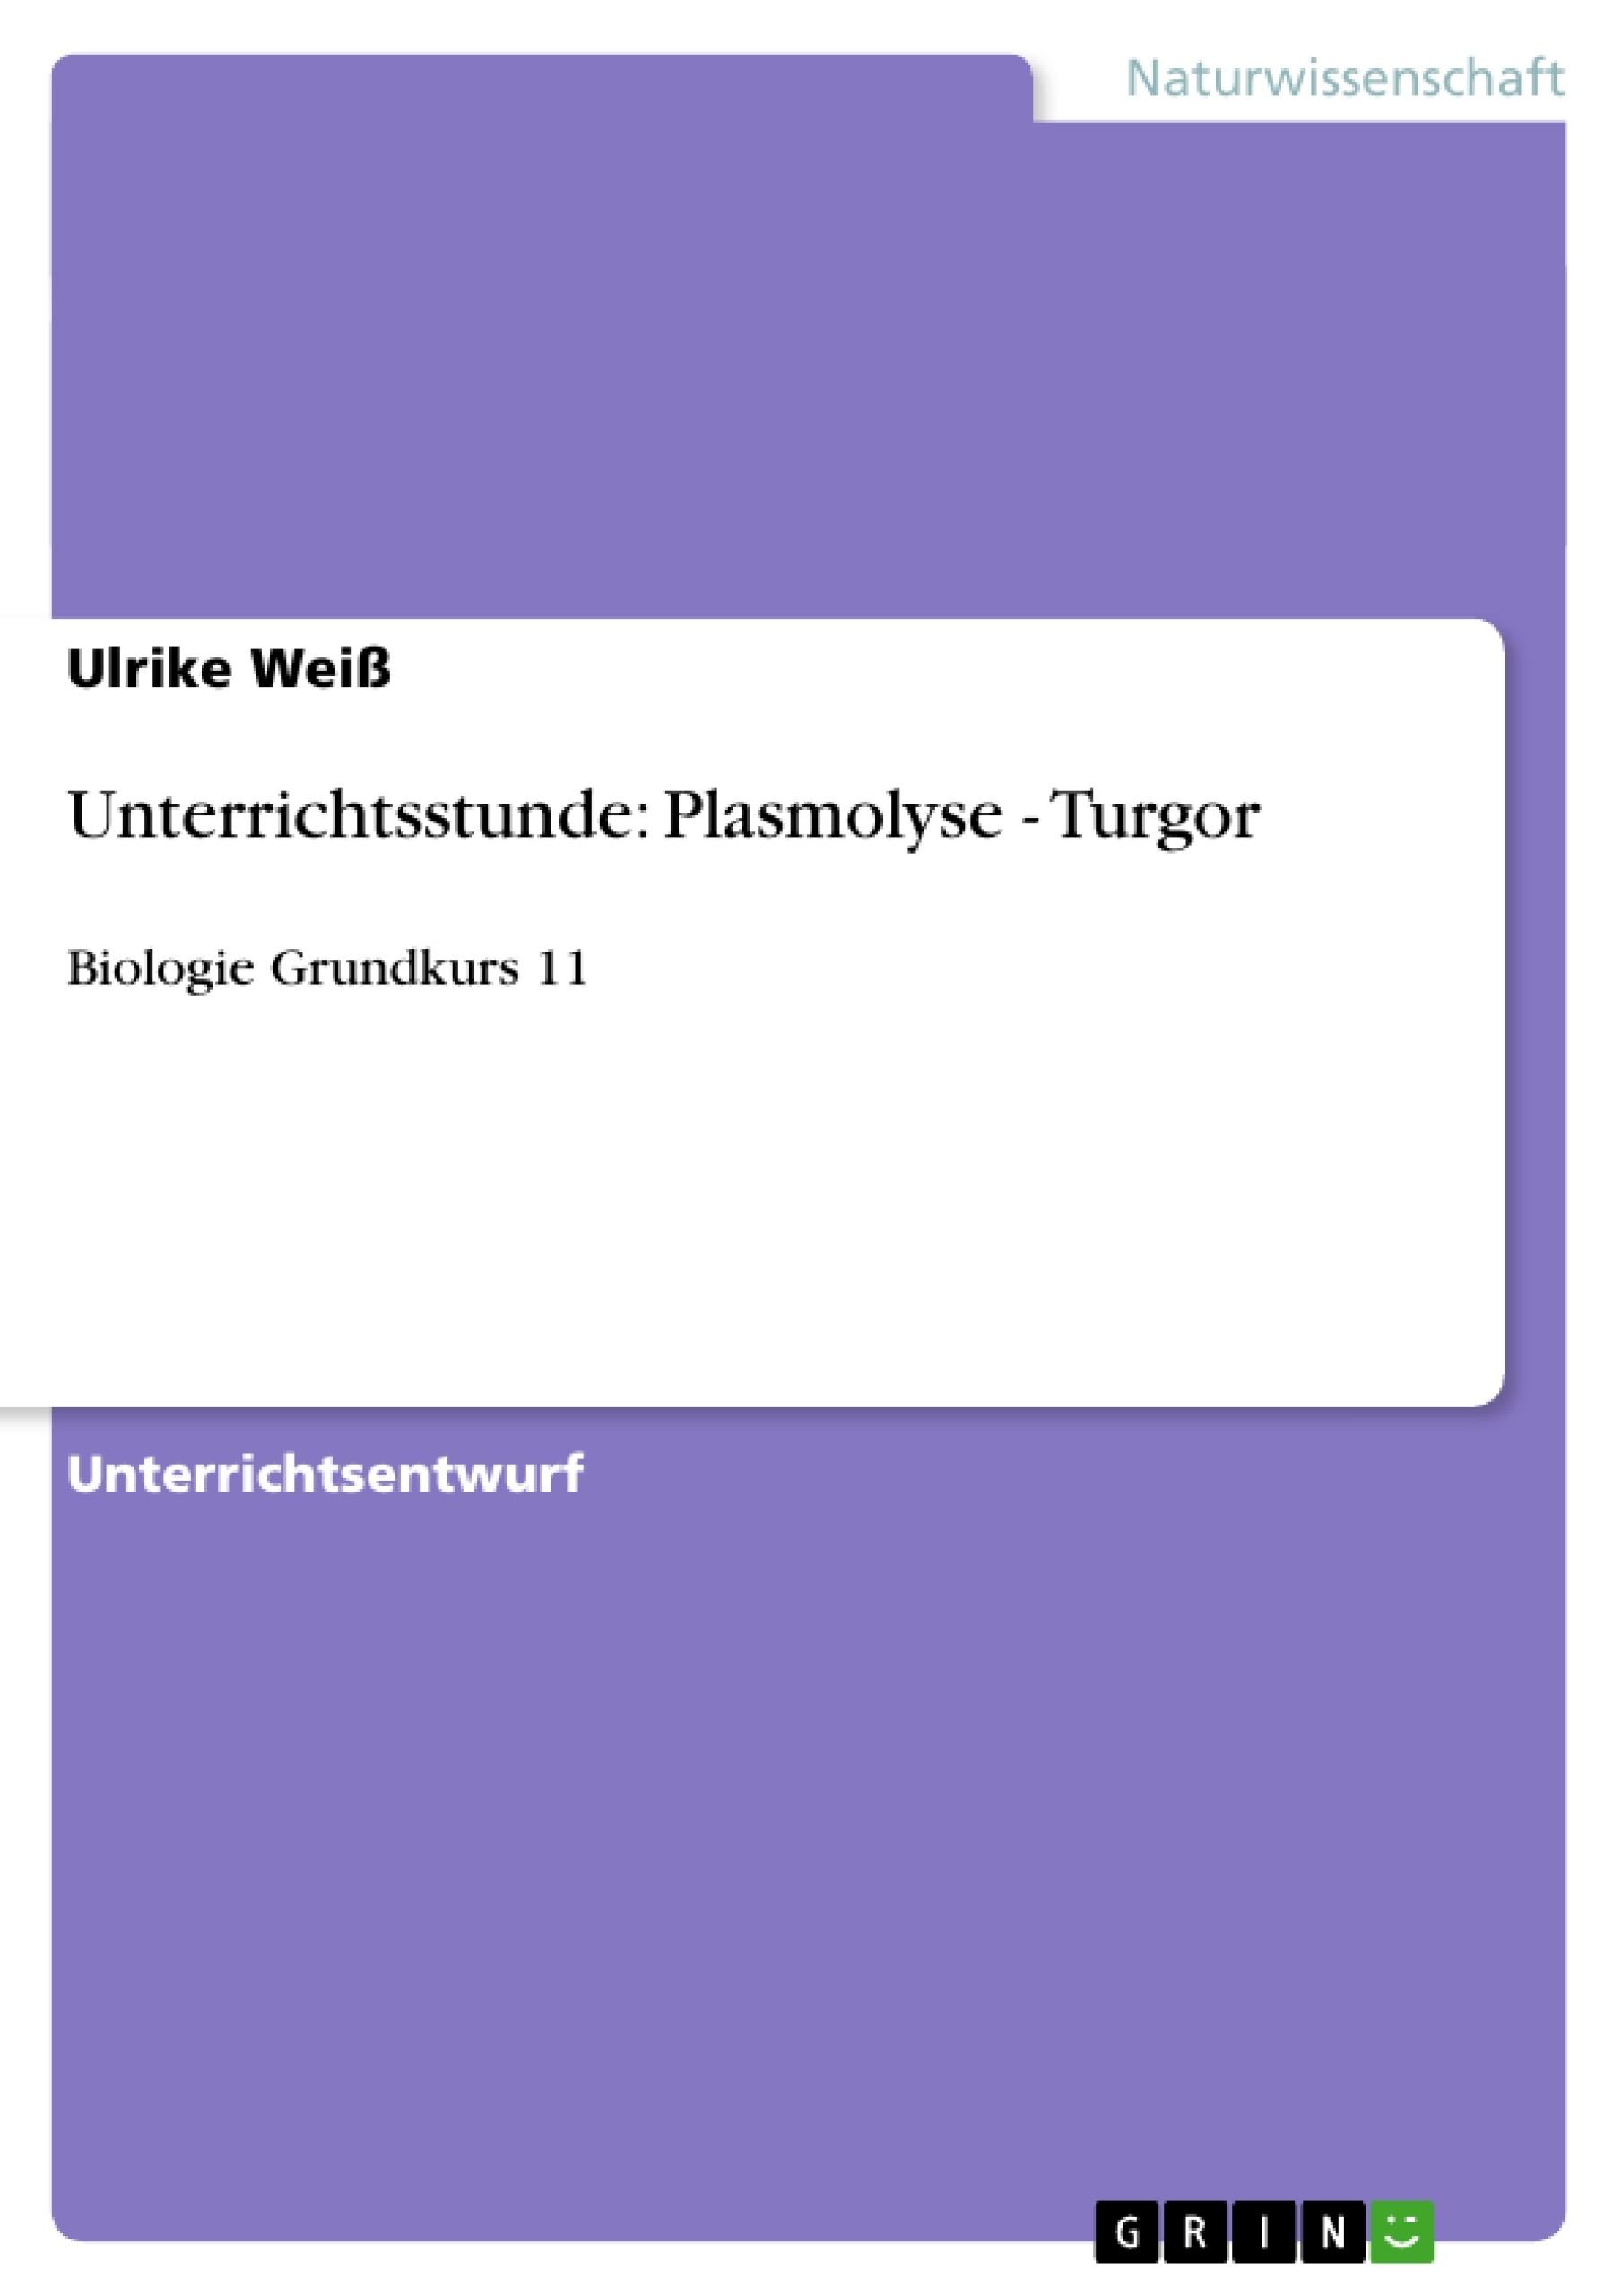 Titel: Unterrichtsstunde: Plasmolyse - Turgor